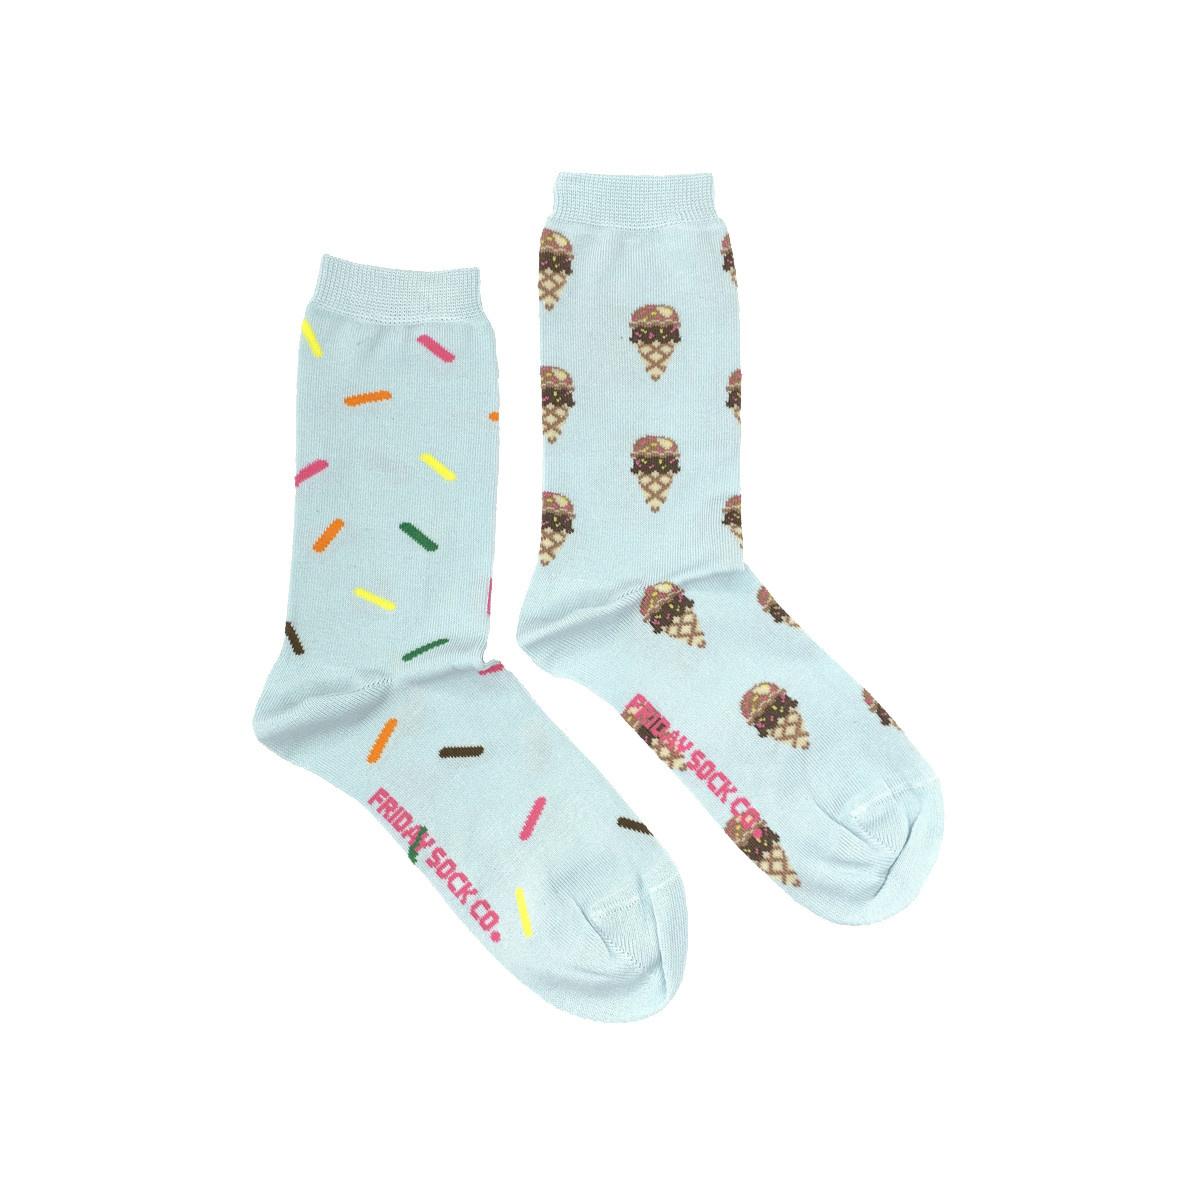 Friday Sock Co. Friday Sock Co. Women's Ice cream & Sprinkles Crew W 5 - 10 (M - 4 - 8)